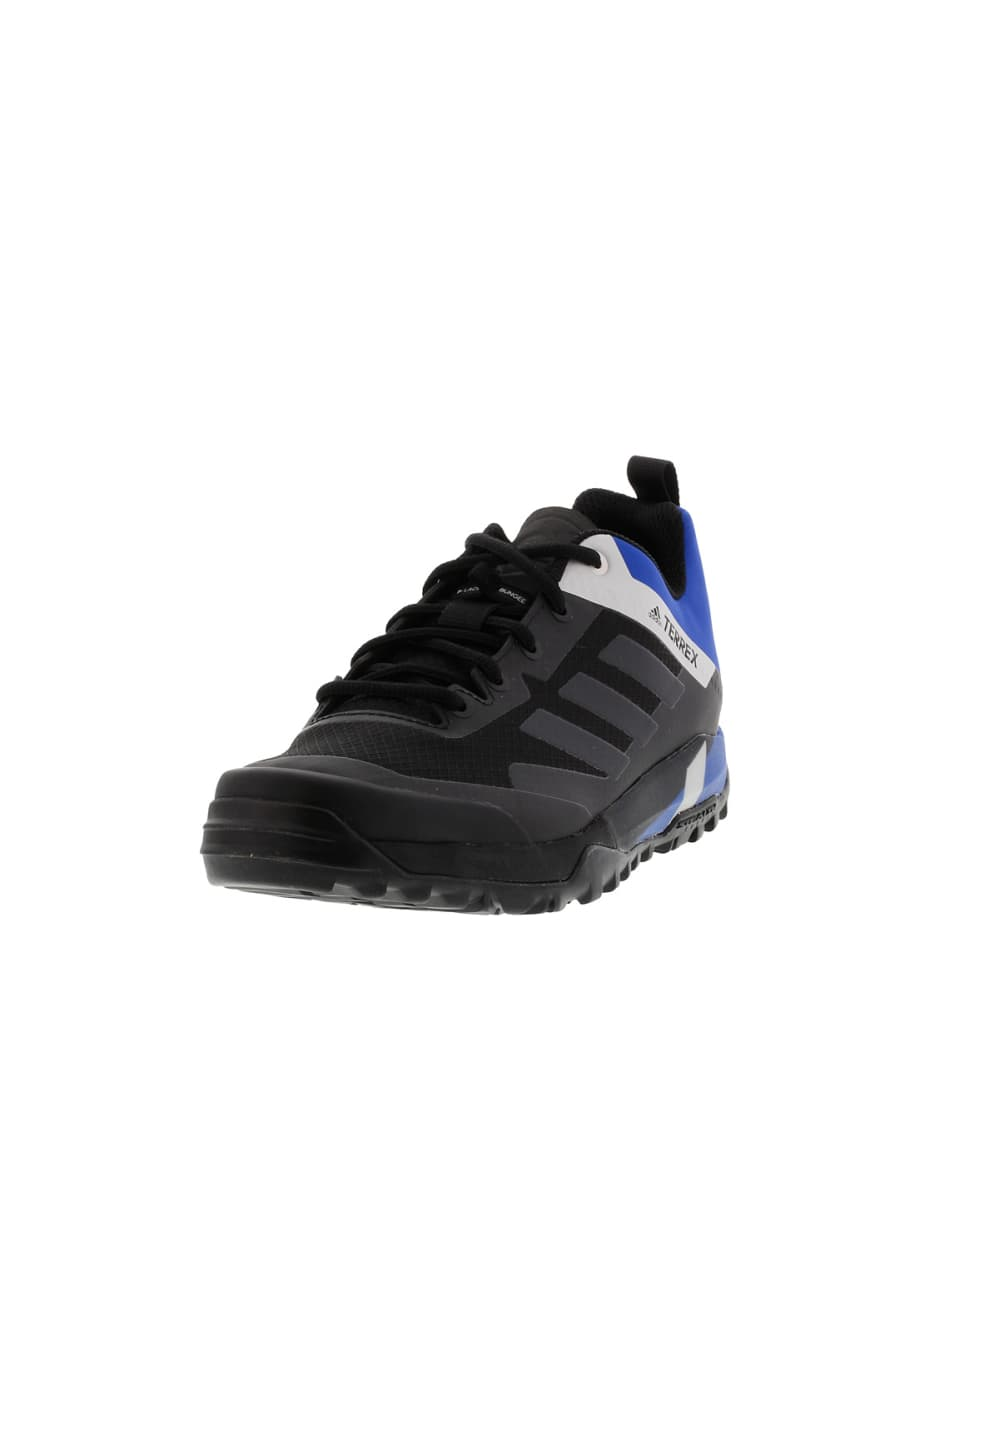 9edb0e6dfc8d38 adidas-terrex-terrex-trail-cross-sl-outdoor-shoes -men-black-pid-0002000436700.jpg